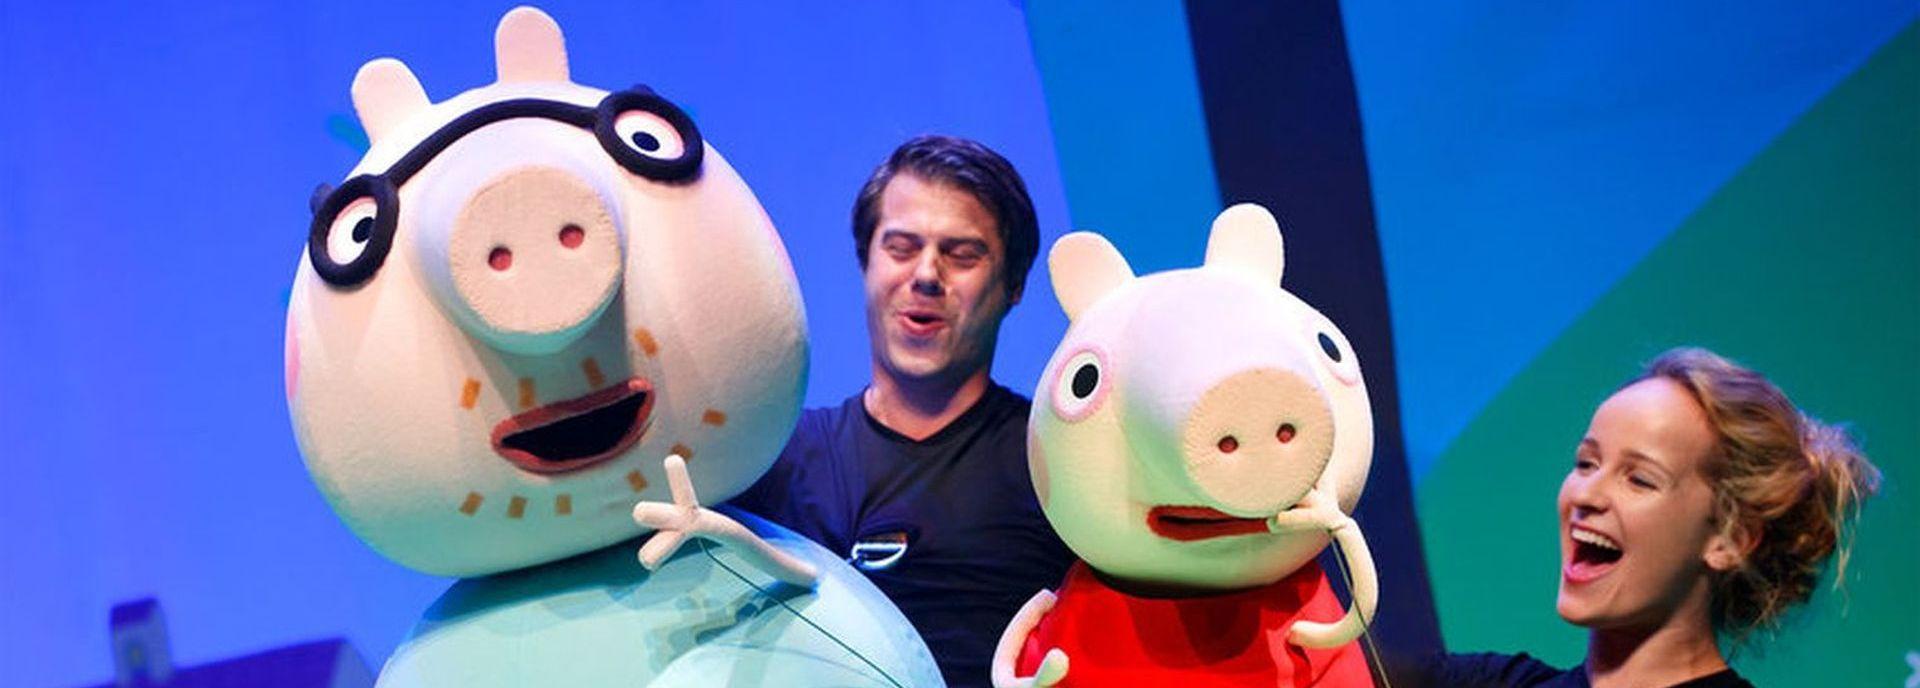 Peppa Pig stond in De Tamboer met De Grote Plons